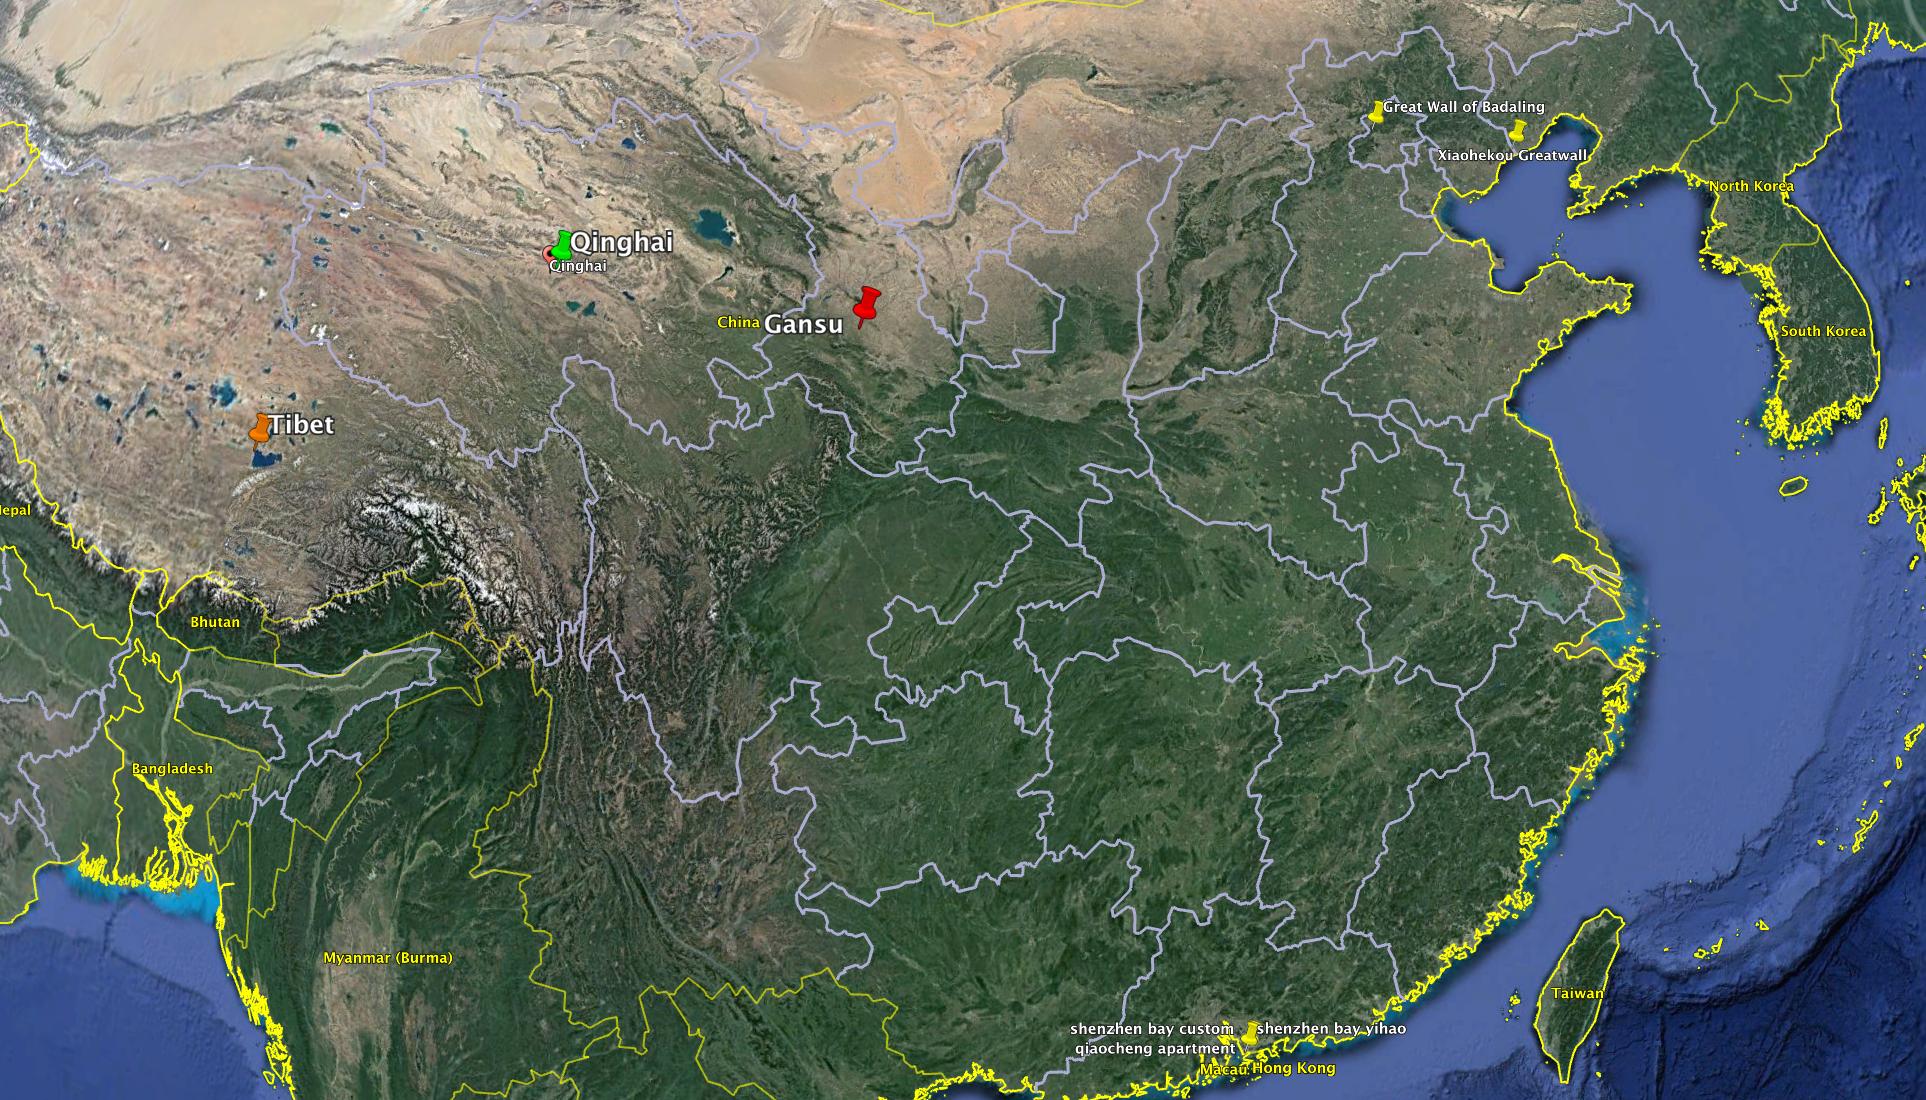 Tibet, Qinghai, and Gansu, where Tibetan mastiffs are seen and traded.